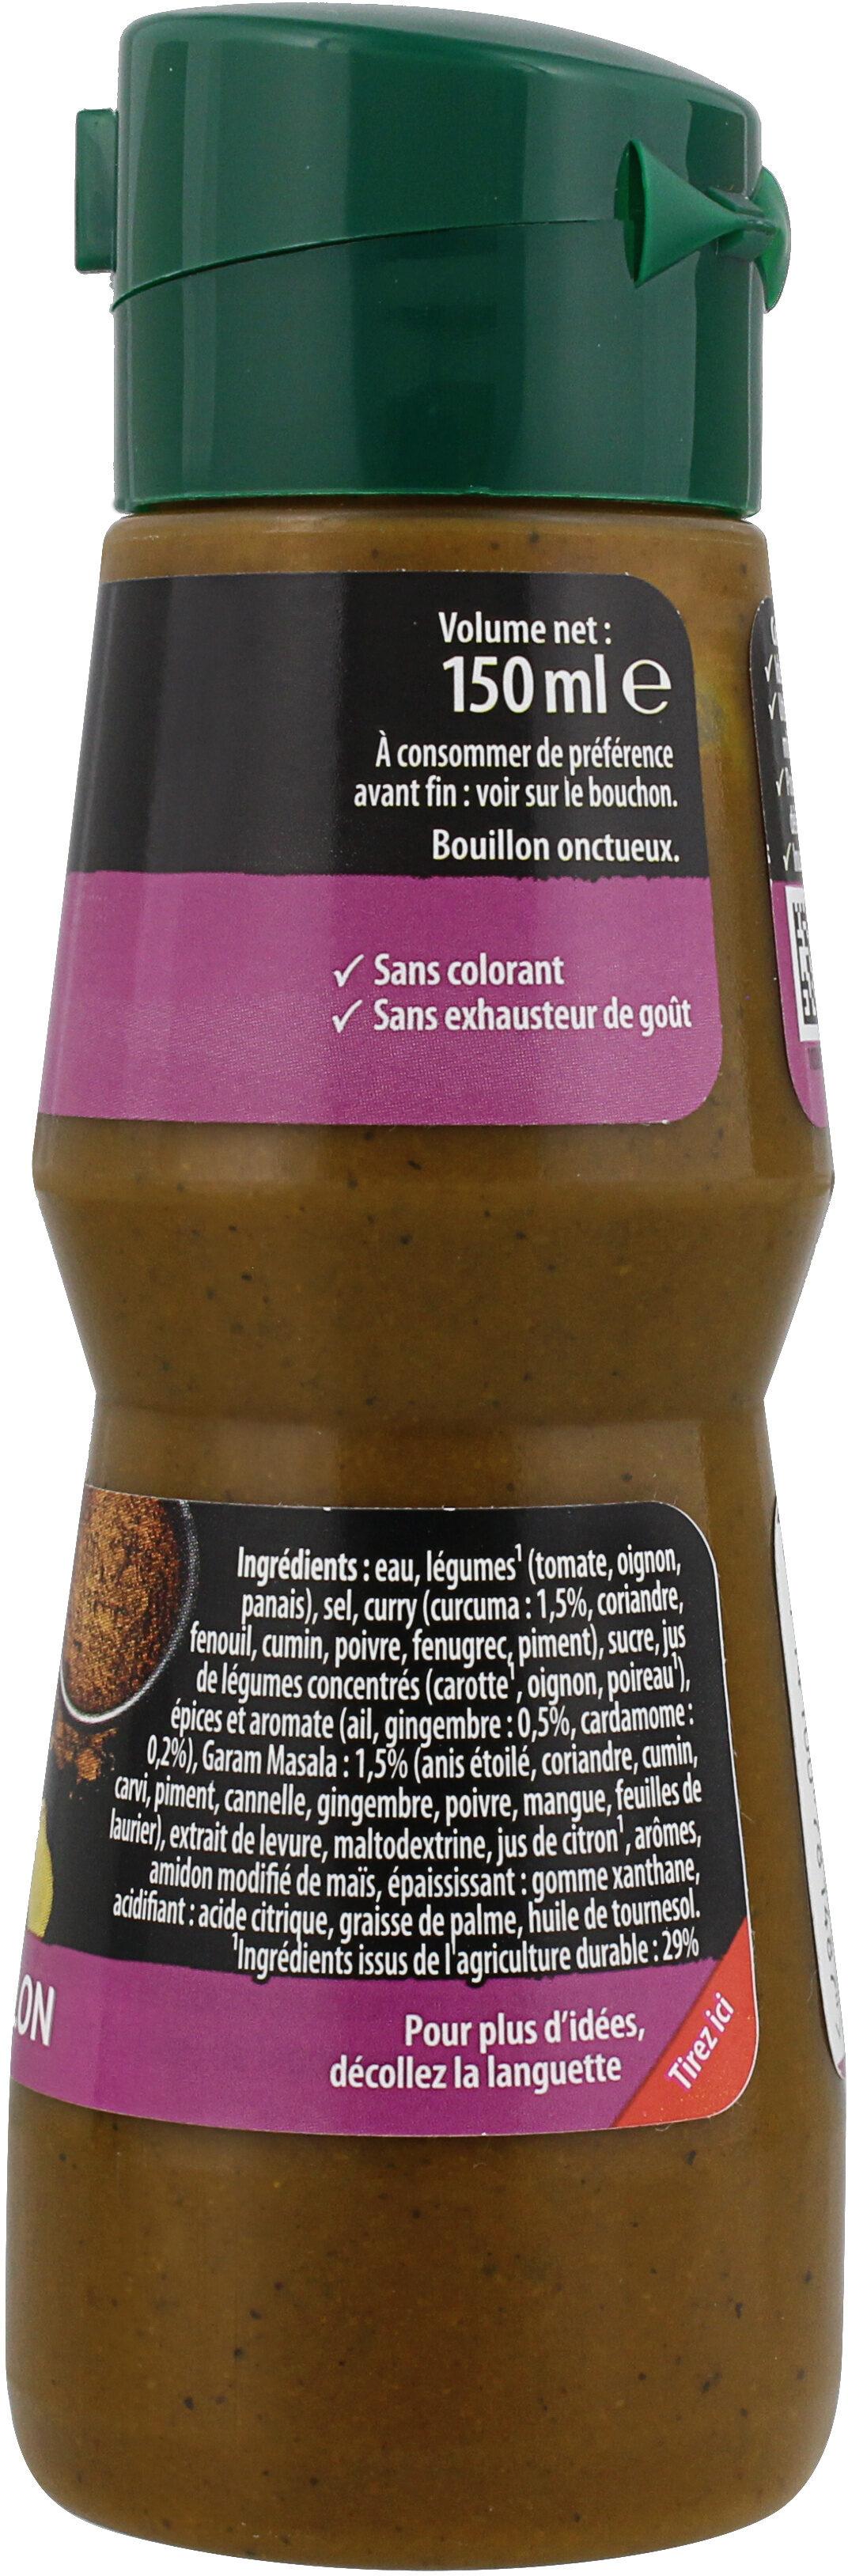 Knorr Goutte de Bouillon Assaisonnement Liquide Saveur Indien 150 ml - Ingrediënten